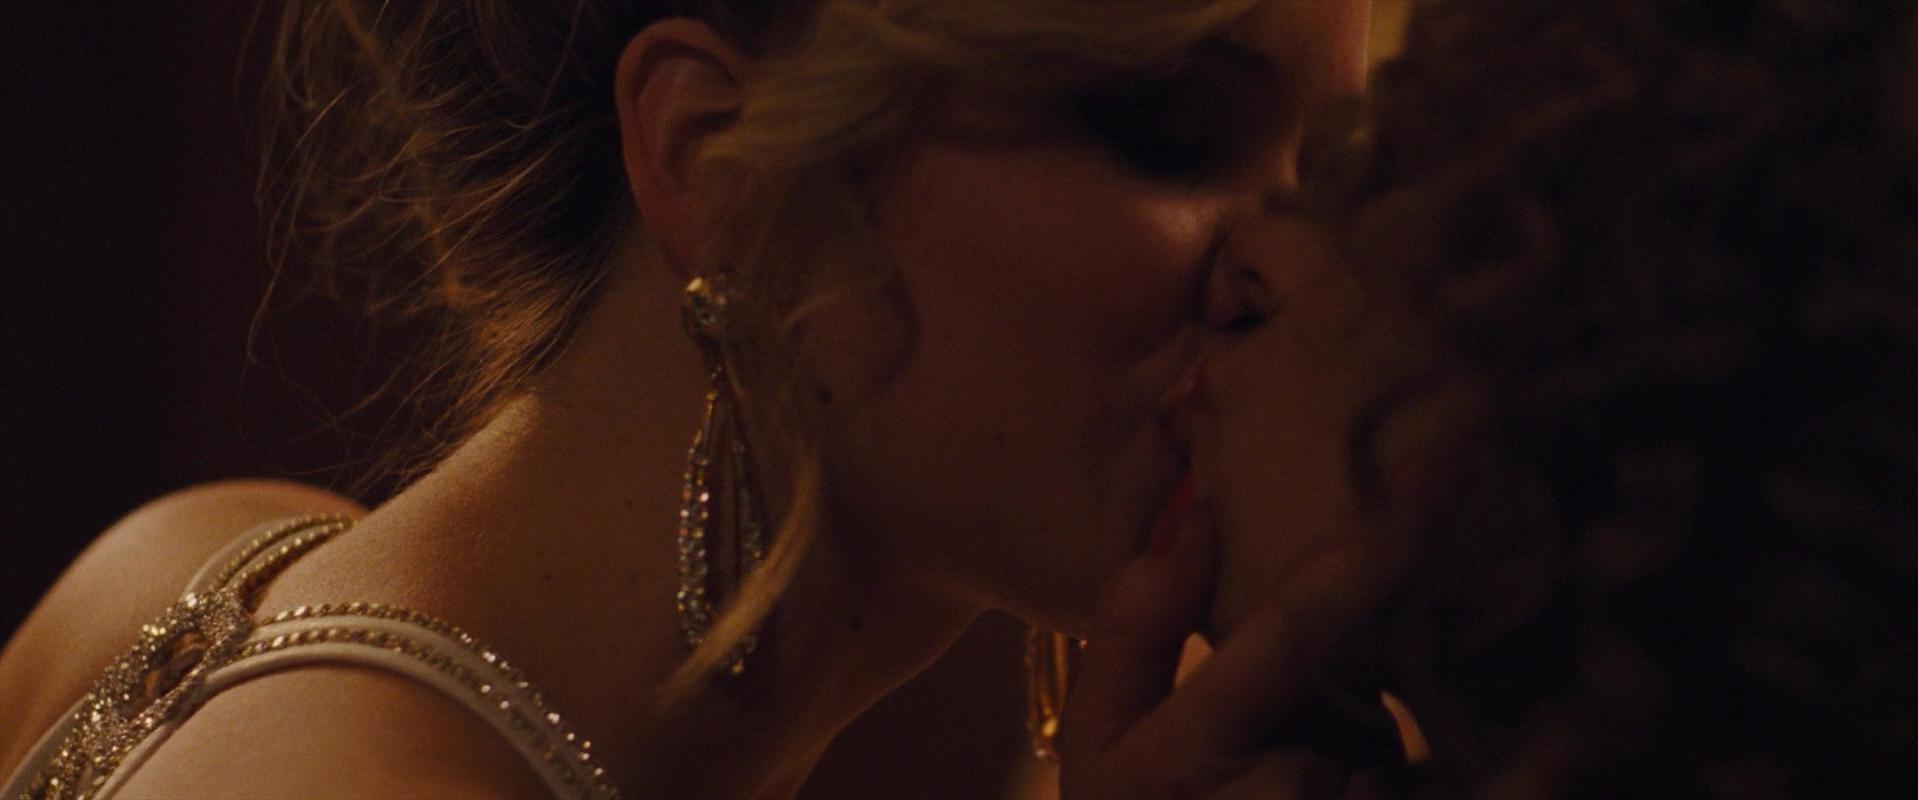 Jennifer Lawrence sexy - American Hustle (2013)